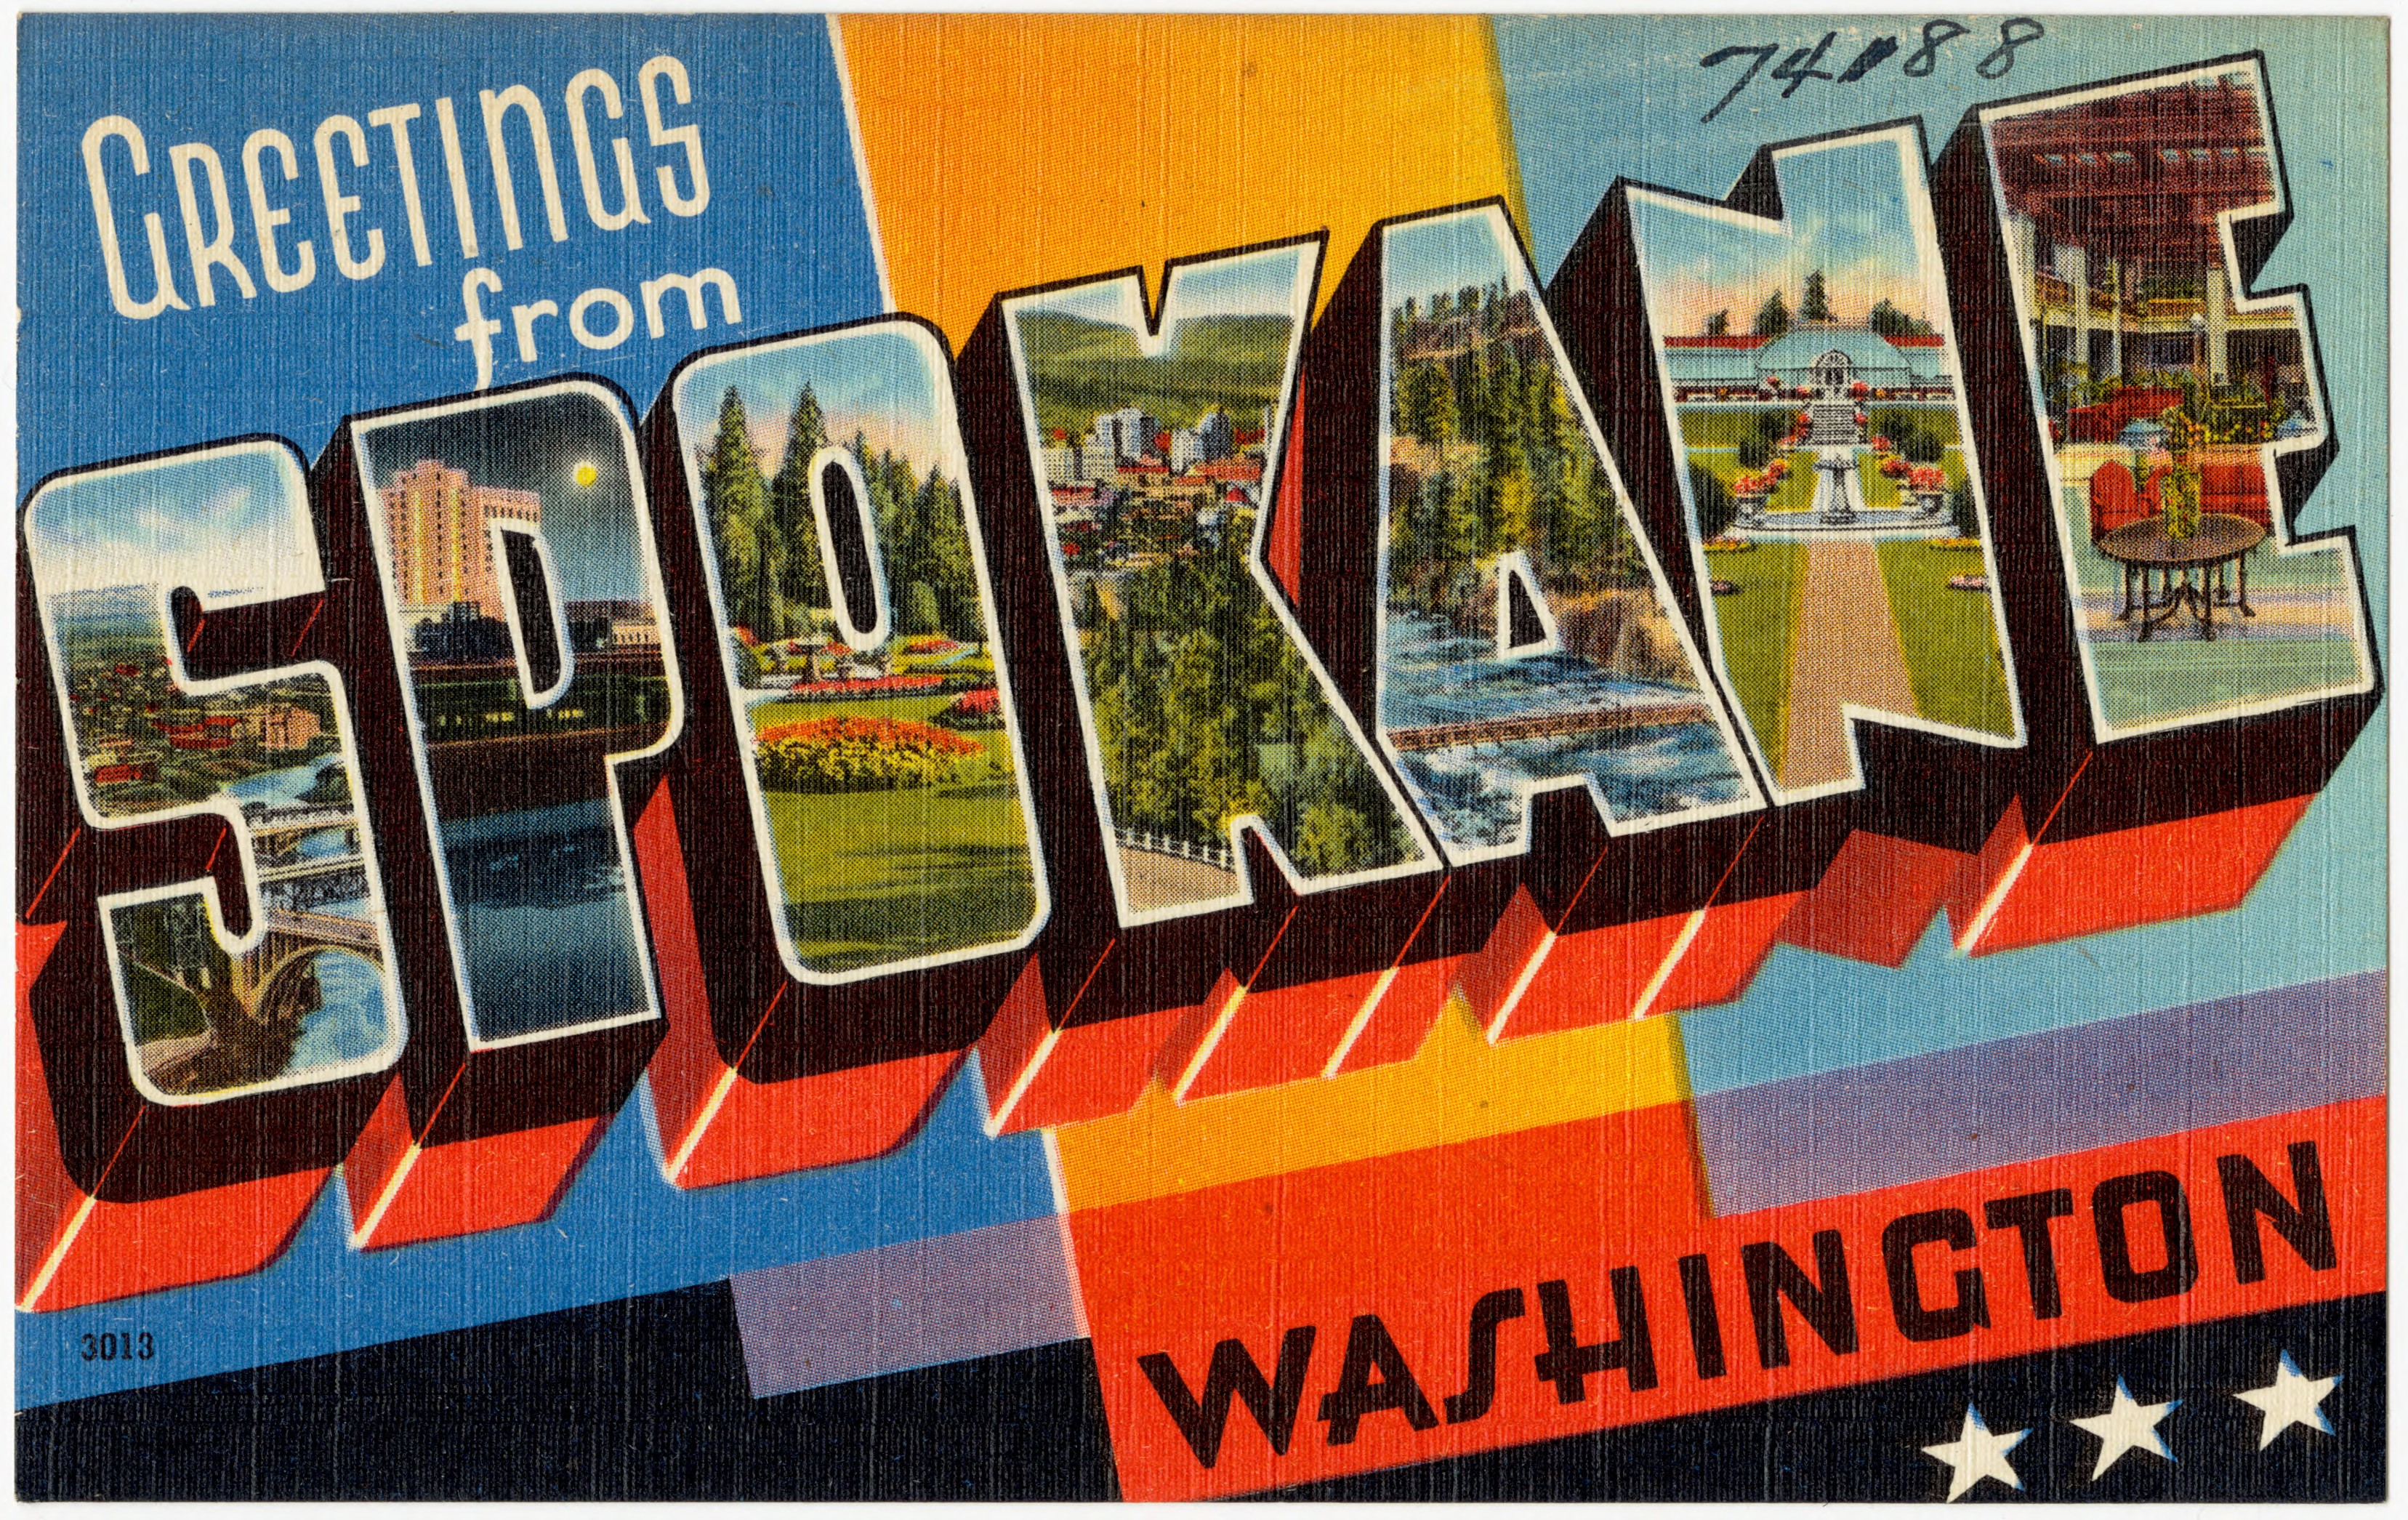 "By Pub. by John W. Graham & Co., Spokane, Washington. ""Tichnor Quality Views,"" Reg. U. S. Pat. Off. Made Only by Tichnor Bros., Inc., Boston, Mass. [Public domain], via Wikimedia Commons"